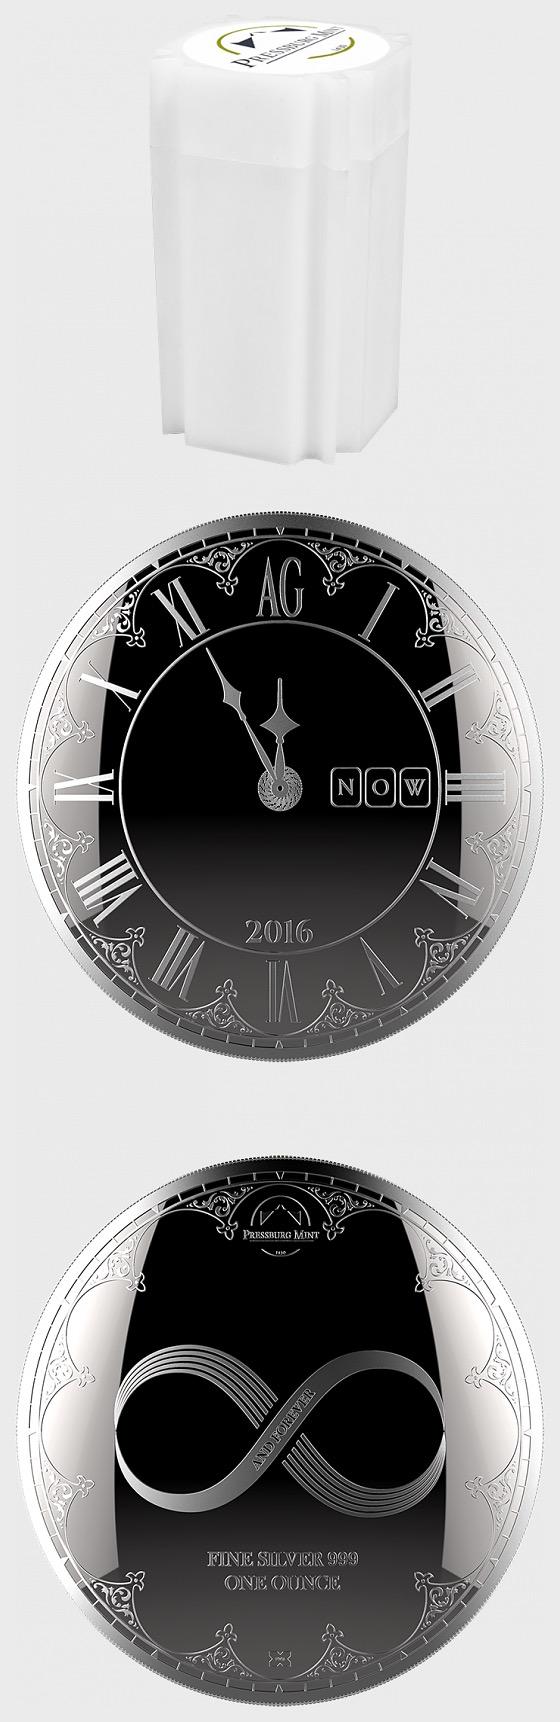 Chronos 2016 - Medallion Tube of 20 Bullion - Silver Bullion